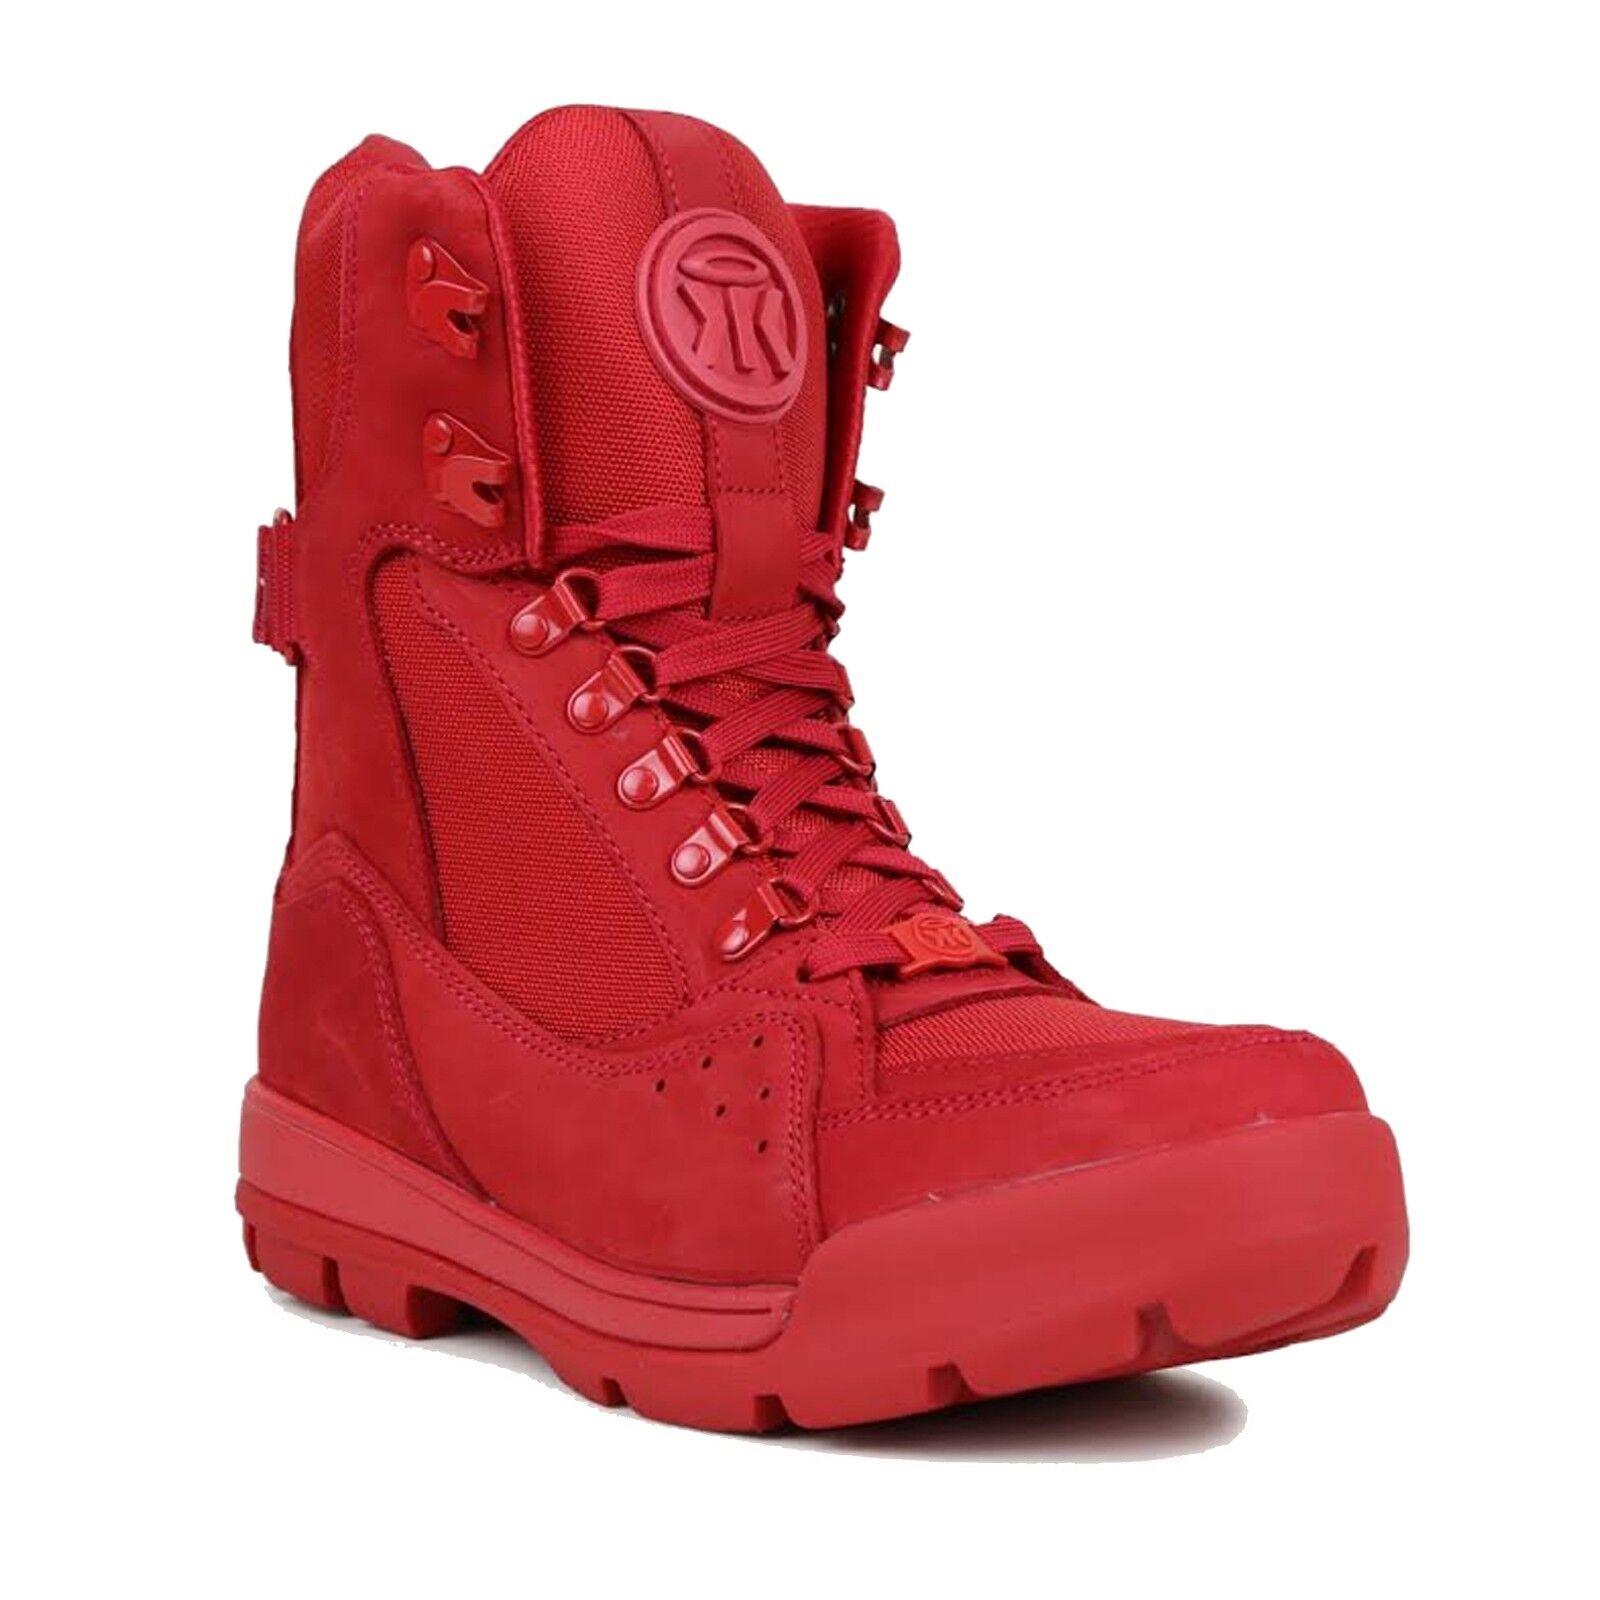 SUMIKKO Mens Venus Red Boots Red Size 11